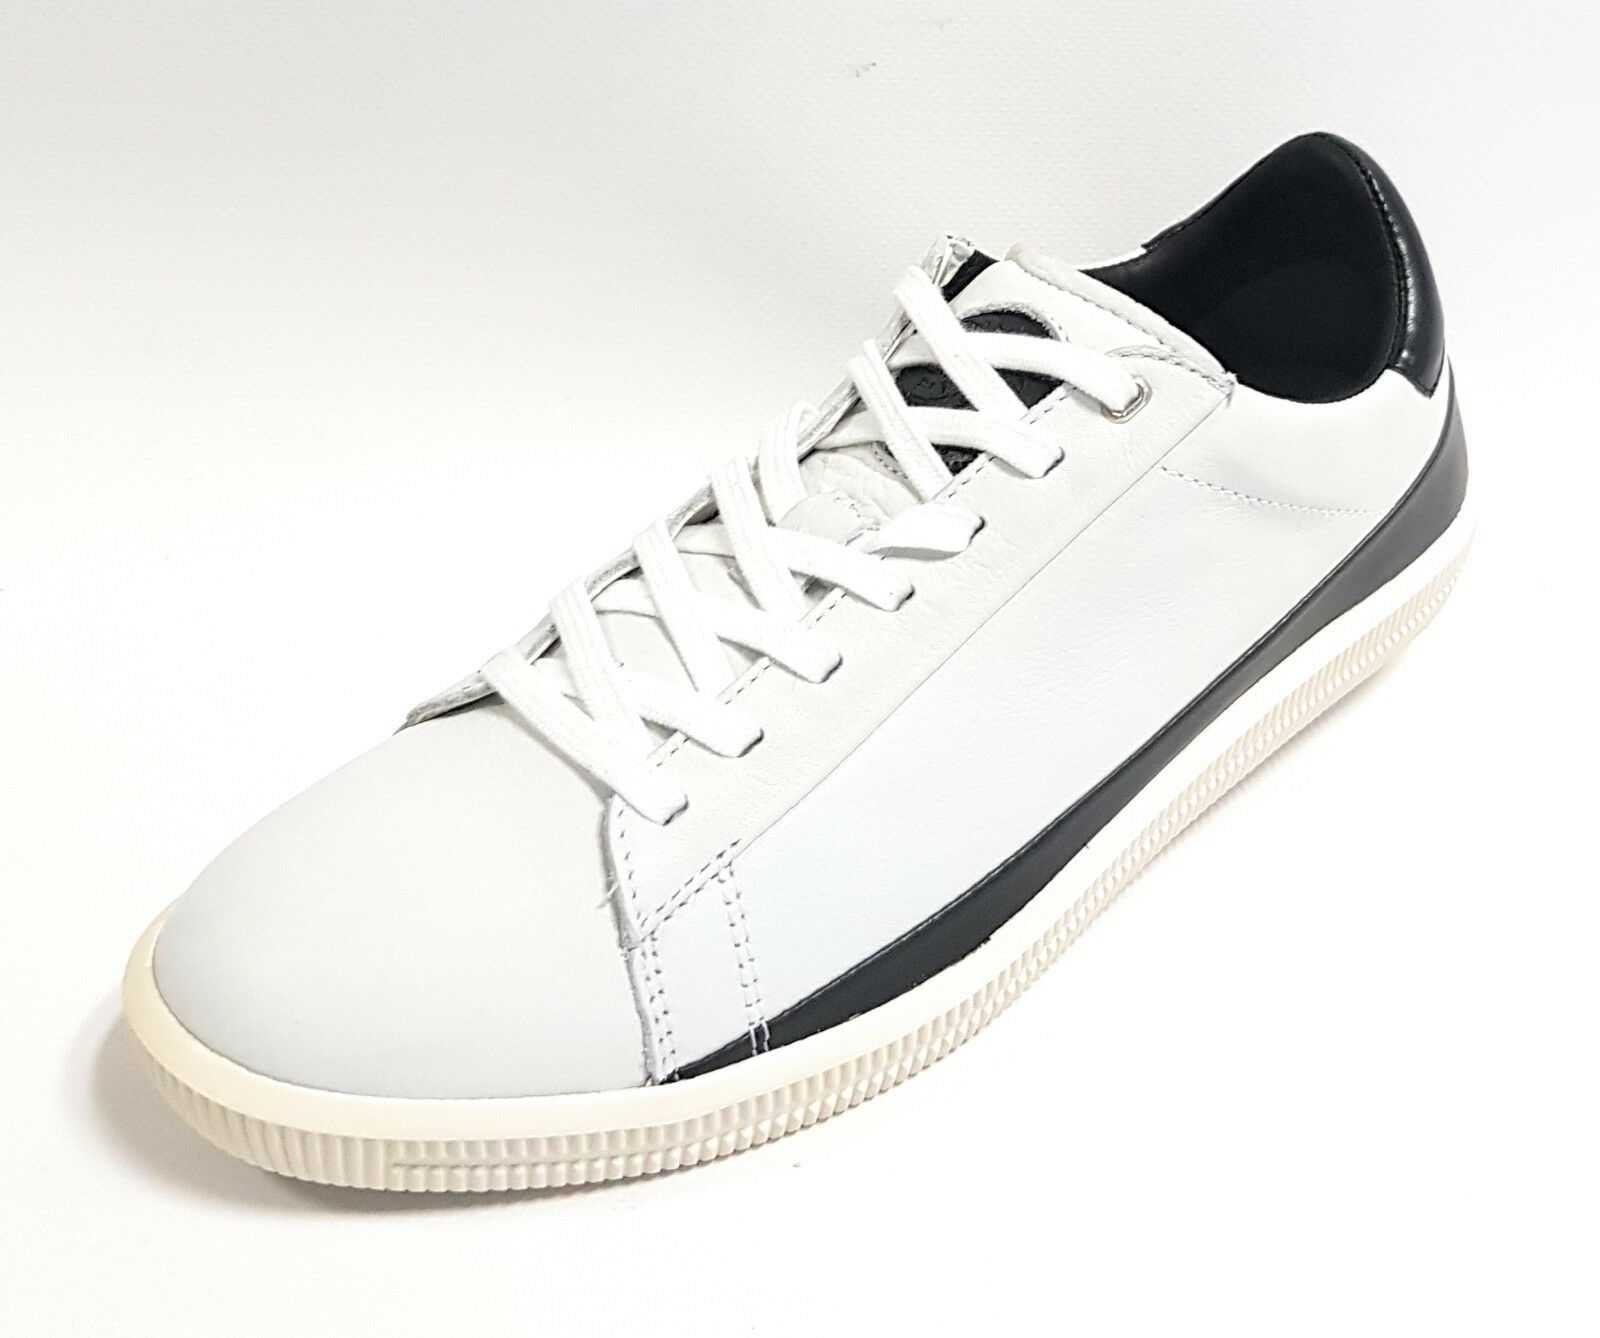 DIESEL D-naptik uomo in pelle scarpe scarpe da ginnastica Uomo SHOES BIANCO-NERO b5